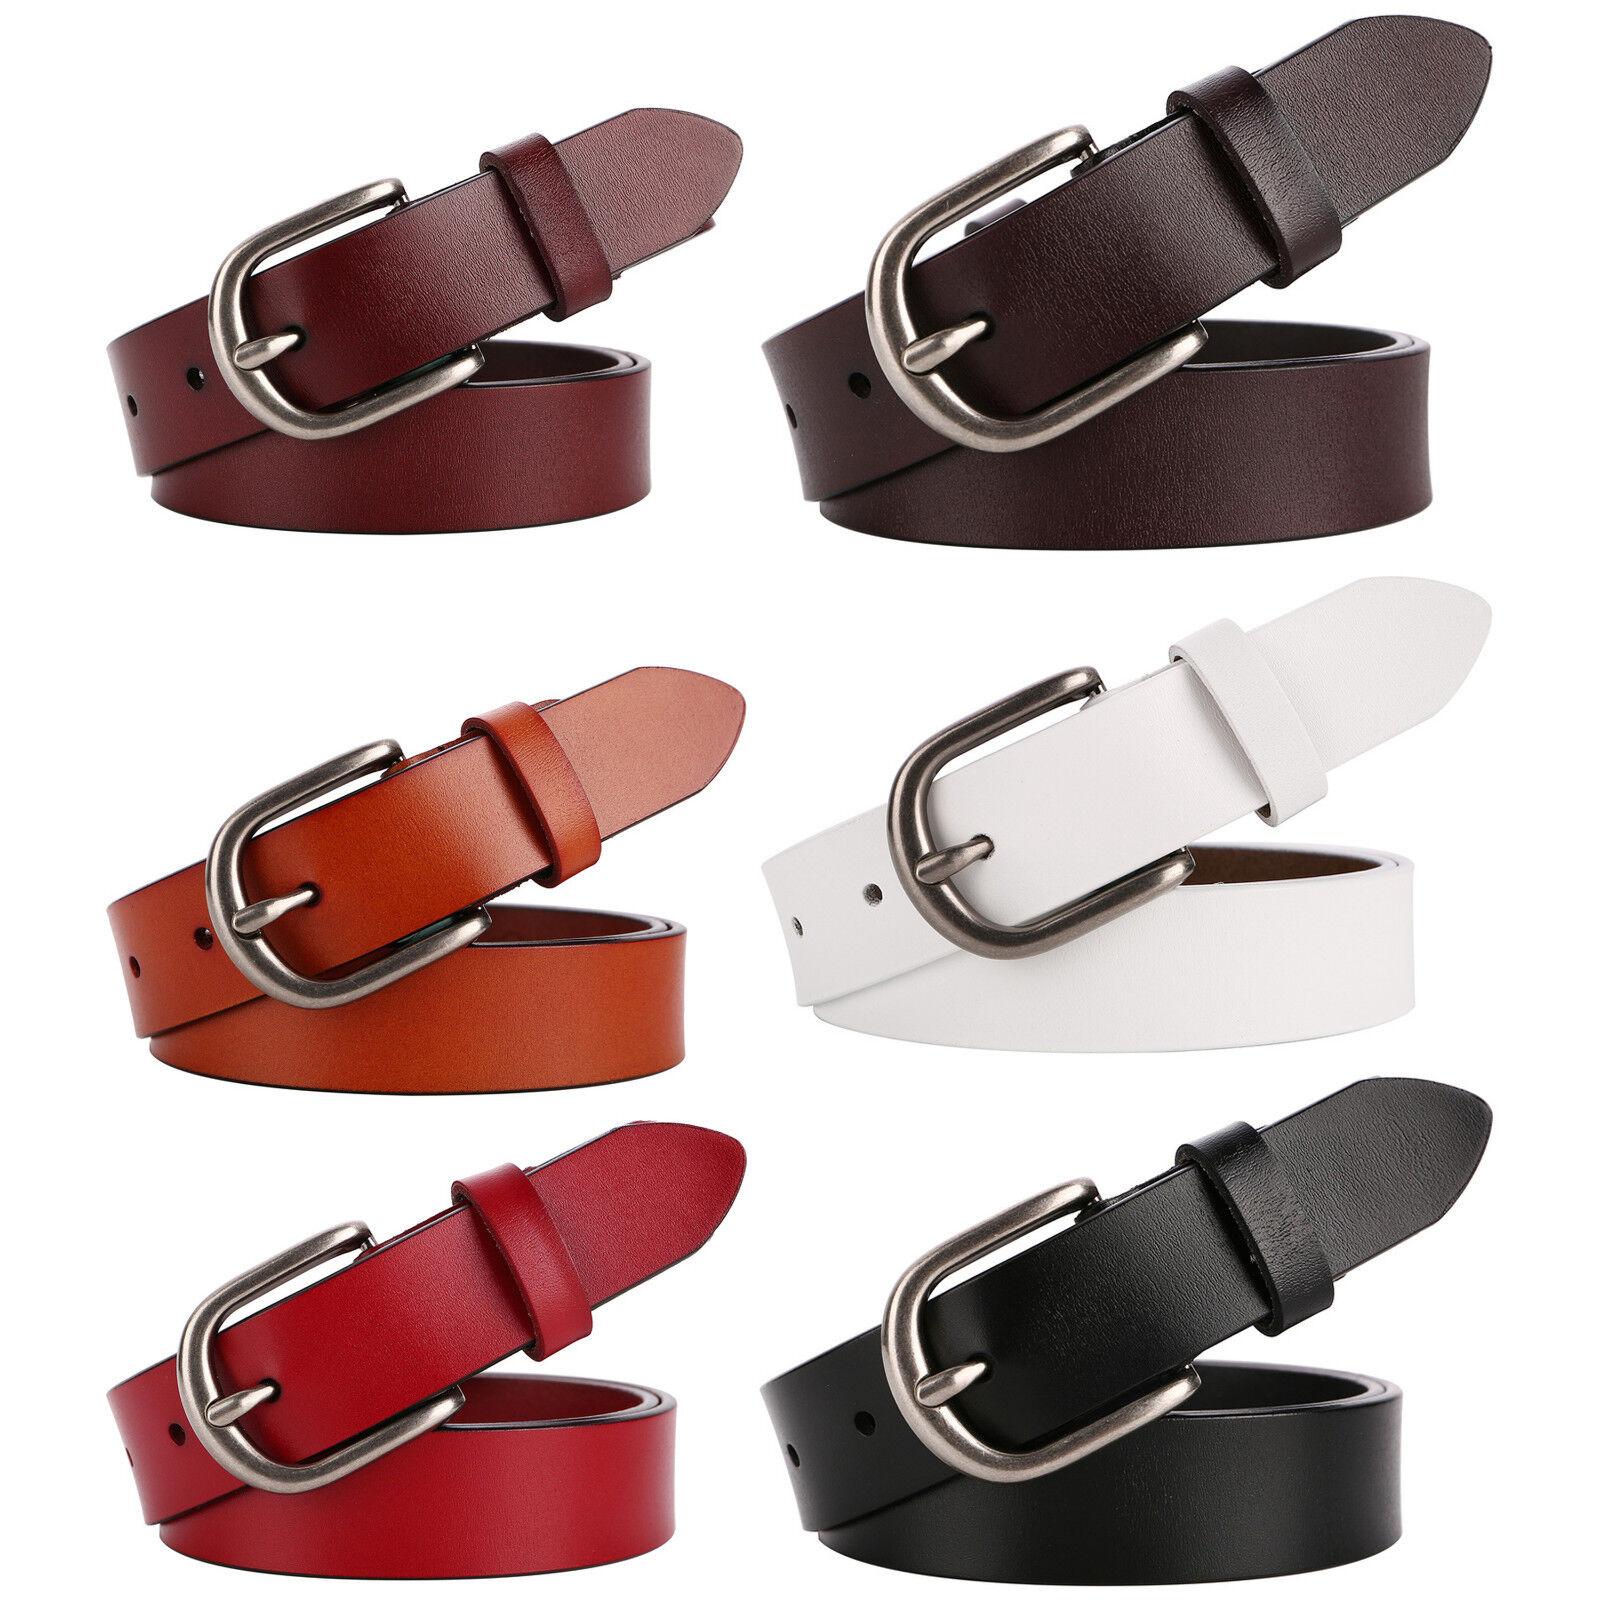 Women's and Teenage Girl's Genuine Leather Classic Metal Buckle Jean Belt Belts